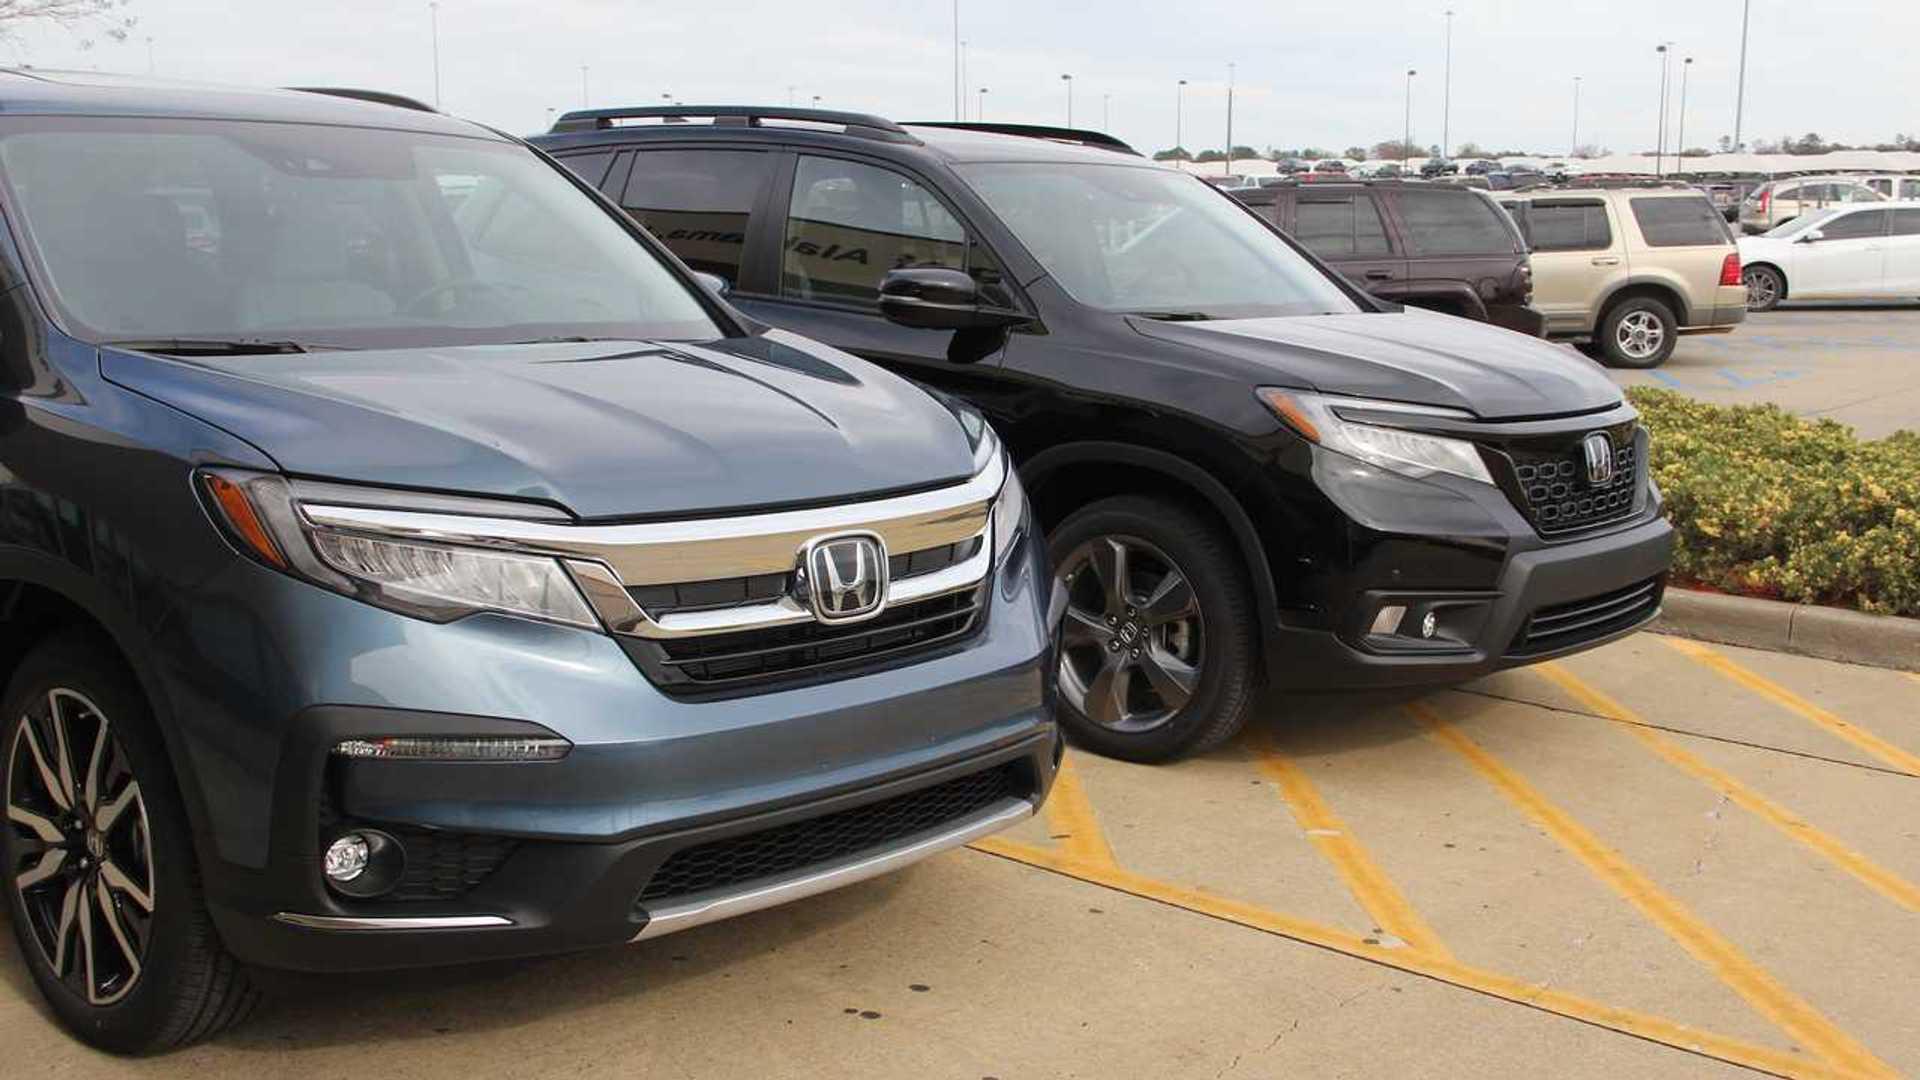 2020 Honda Passport Vs Pilot All Differences >> See The Differences 2019 Honda Passport Versus 2019 Honda Pilot